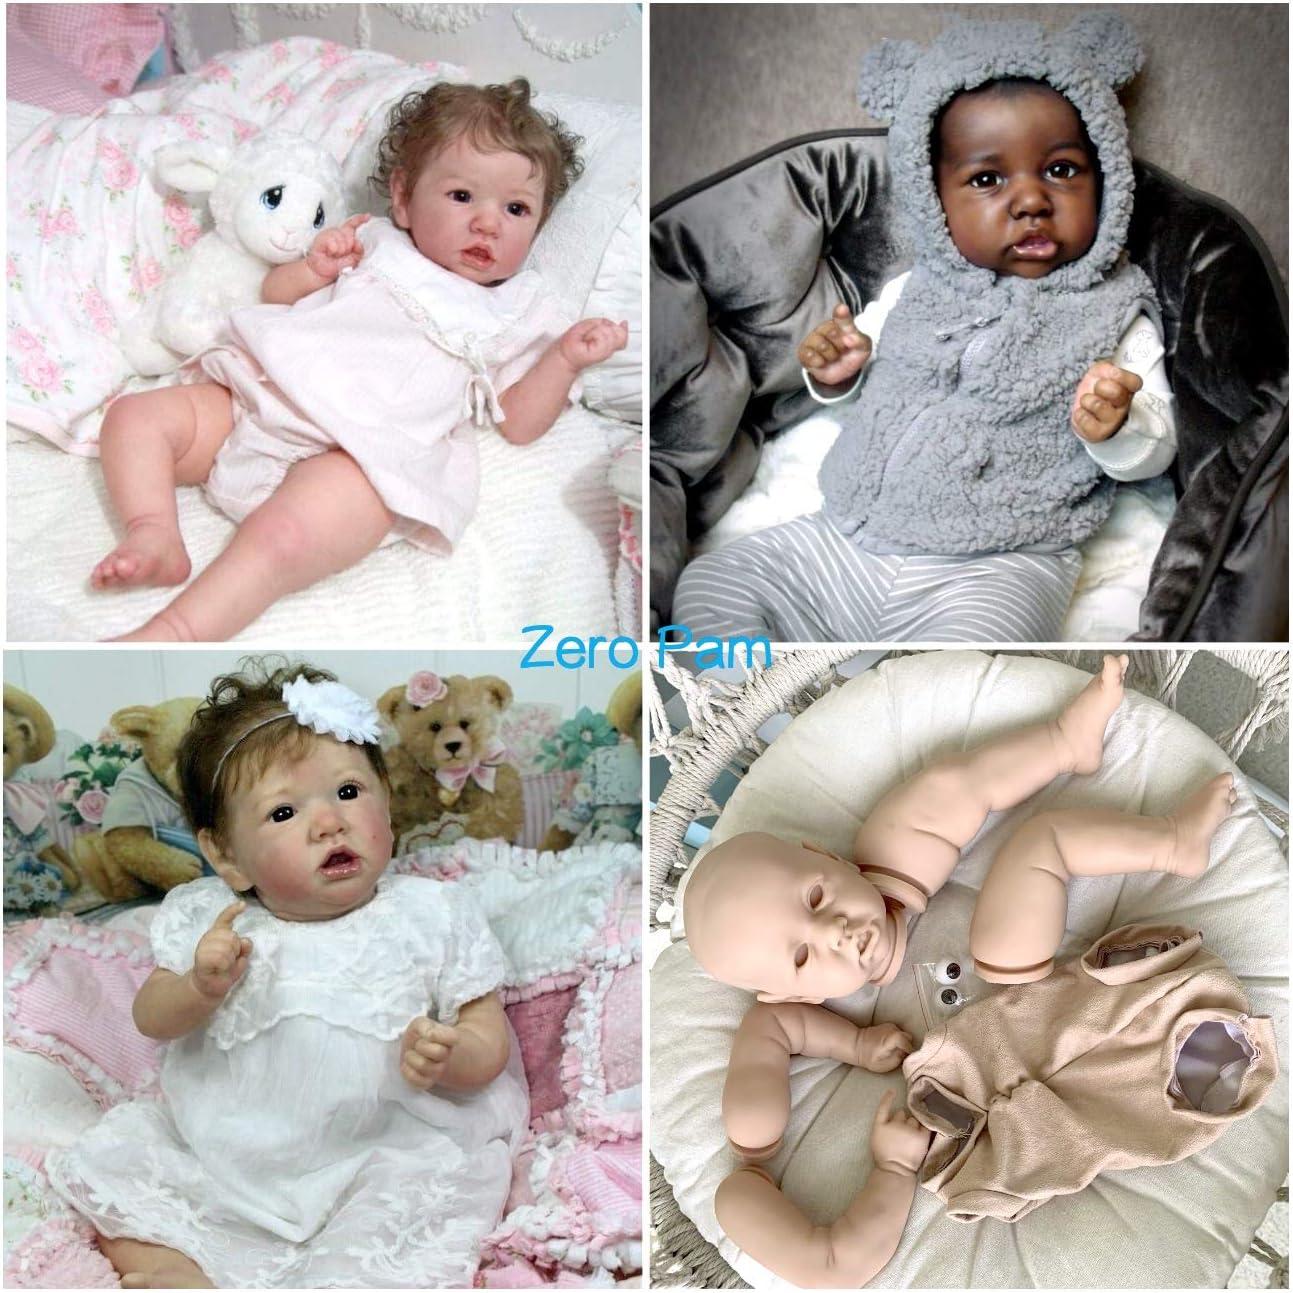 Blue Eyes Zero Pam Reborn Doll Kits 55cm 22 Inch Silicone Full Limbs and Soft Cloth Body Realistic DIY Doll